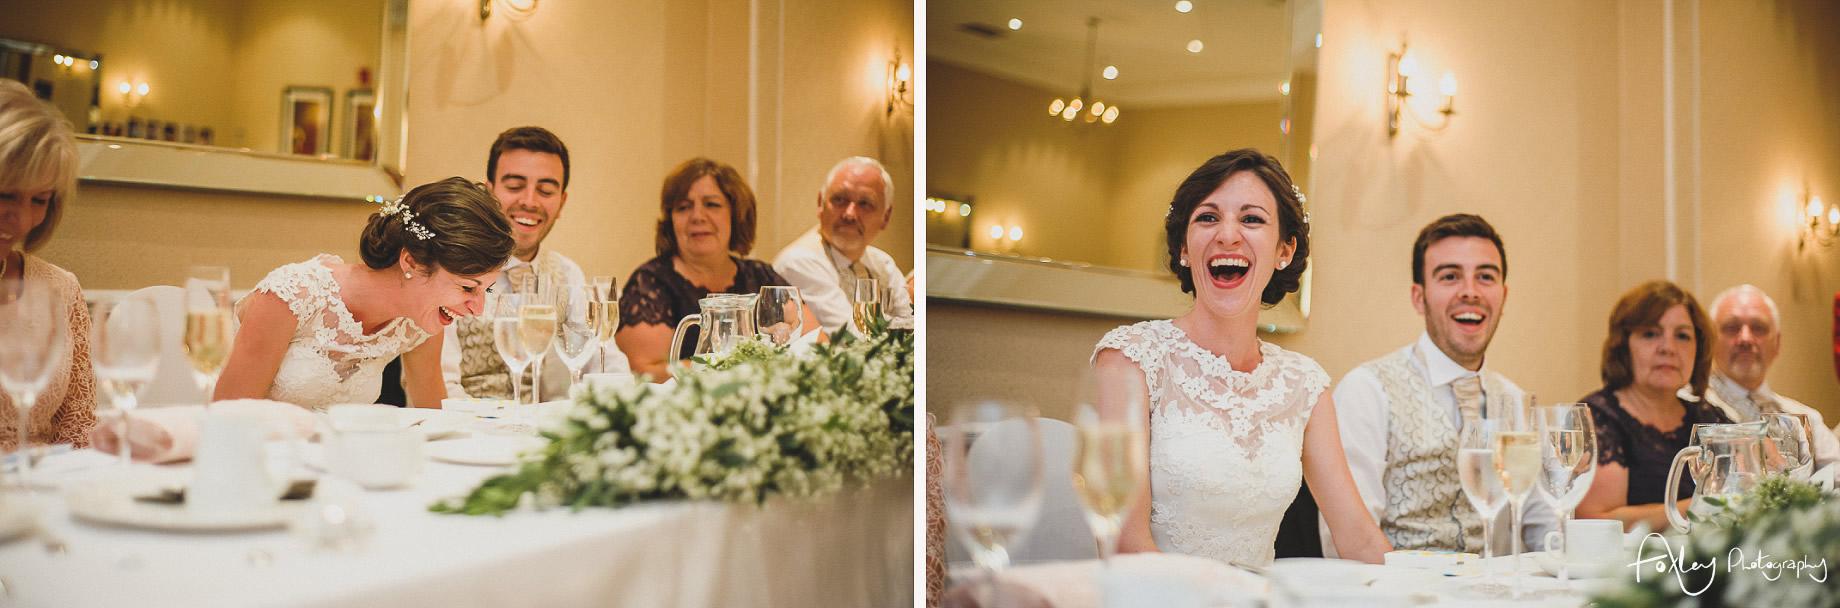 Rebecca and Dan Wedding at Preston Marriott Hotel 112